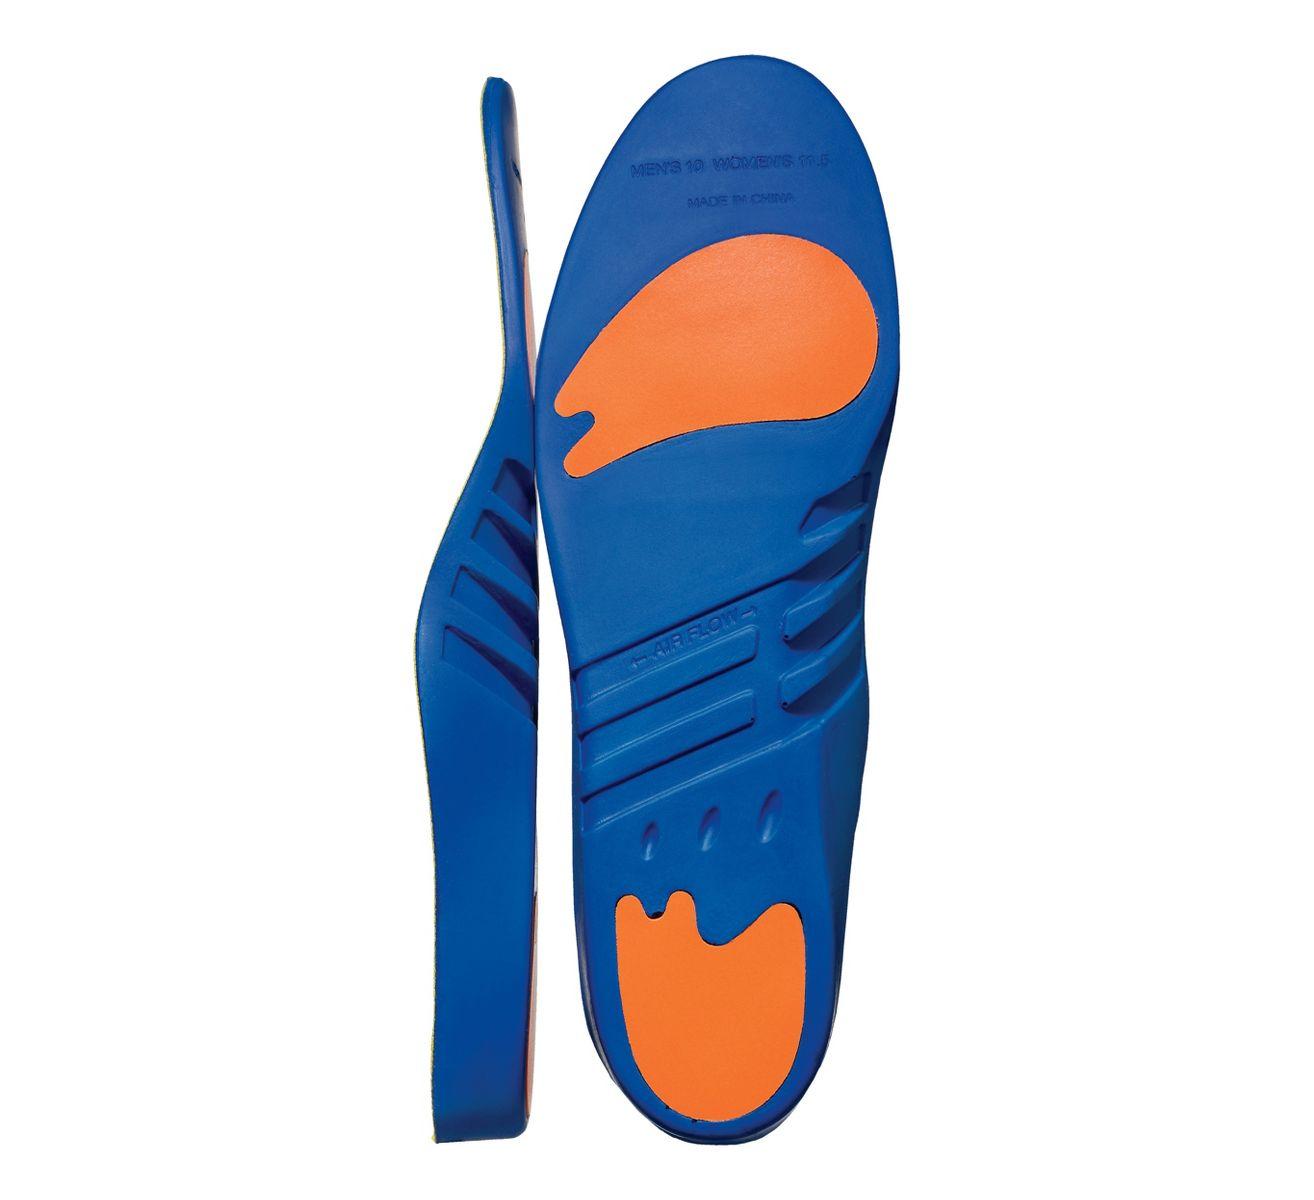 asics shoe inserts